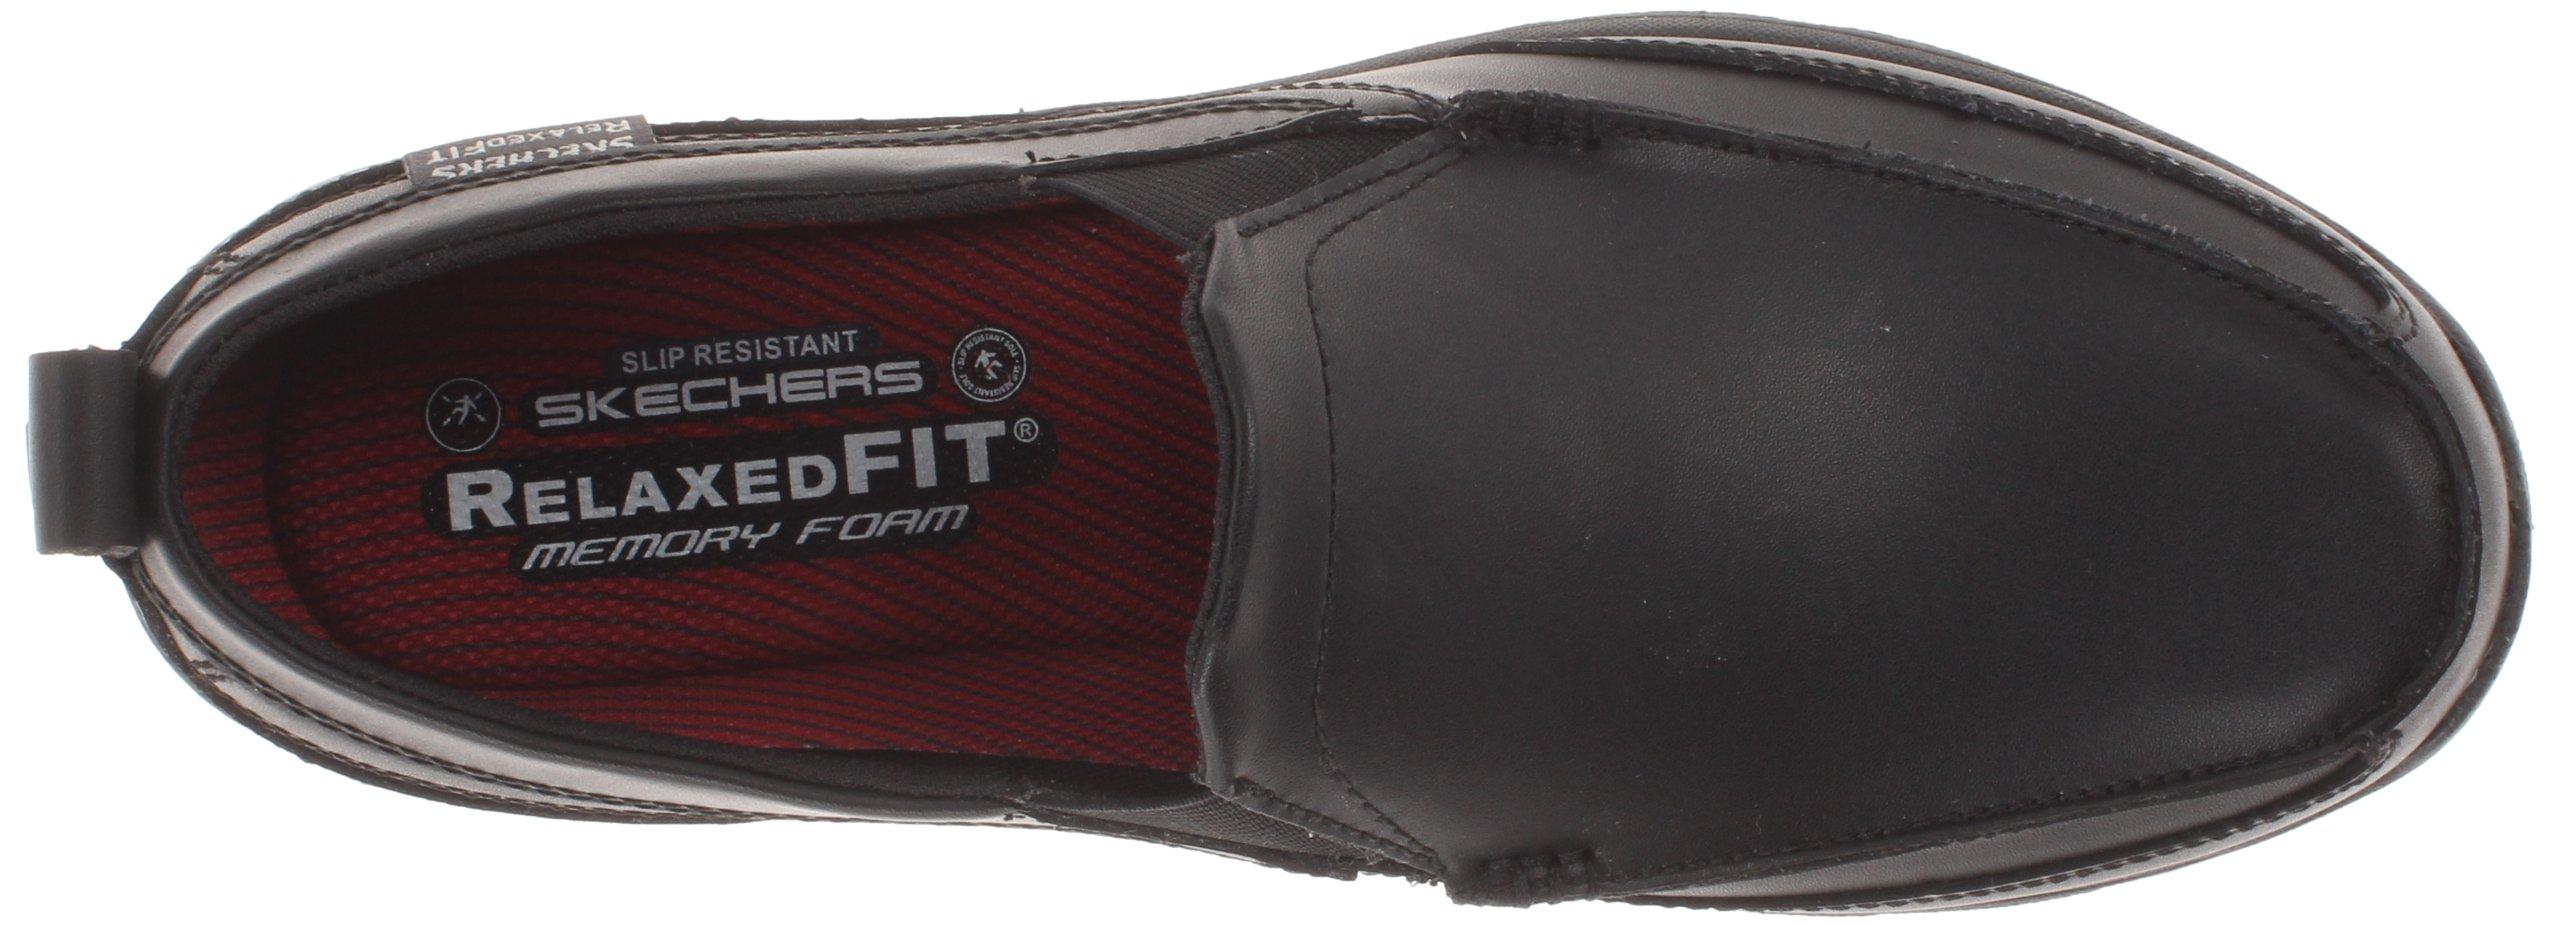 Skechers for Work Men's Hobbes Relaxed Fit Slip Resistant Work Shoe, Black, 11.5 M US by Skechers (Image #7)